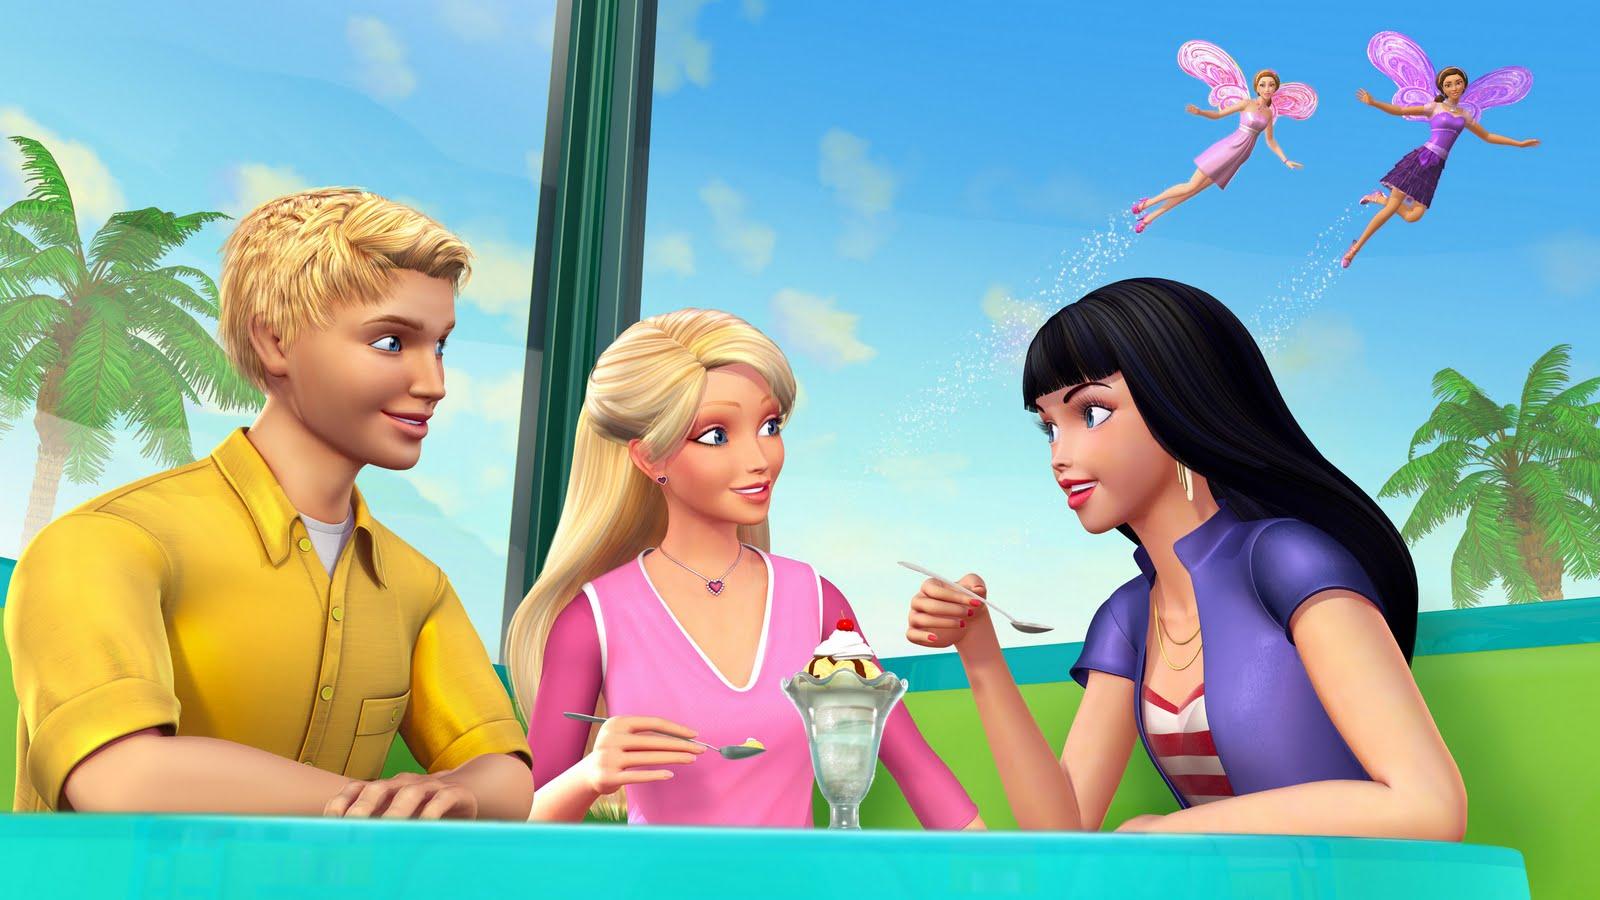 Barbie A Fairy Secret Barbie Movies 19418749 2560 1440  1